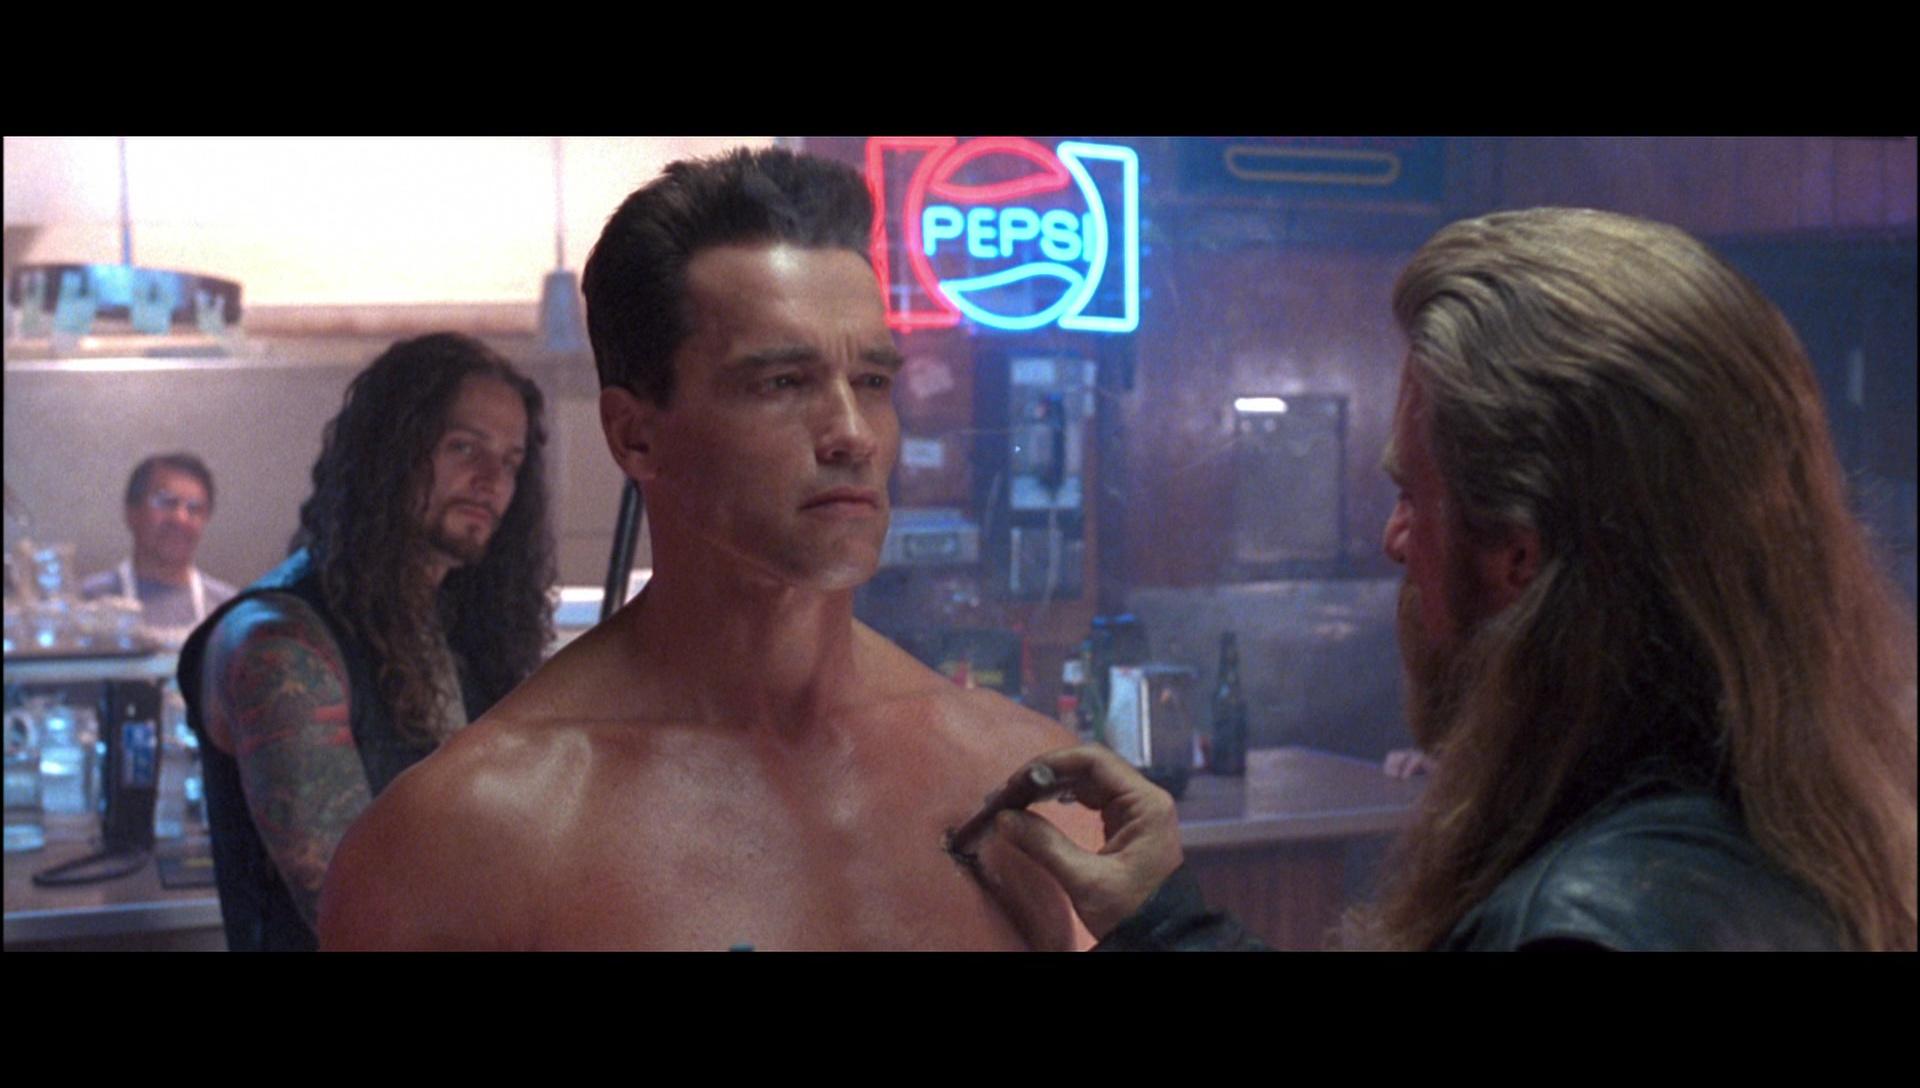 Pepsi Neon Sign In Terminator 2 Judgment Day 1991 Movie